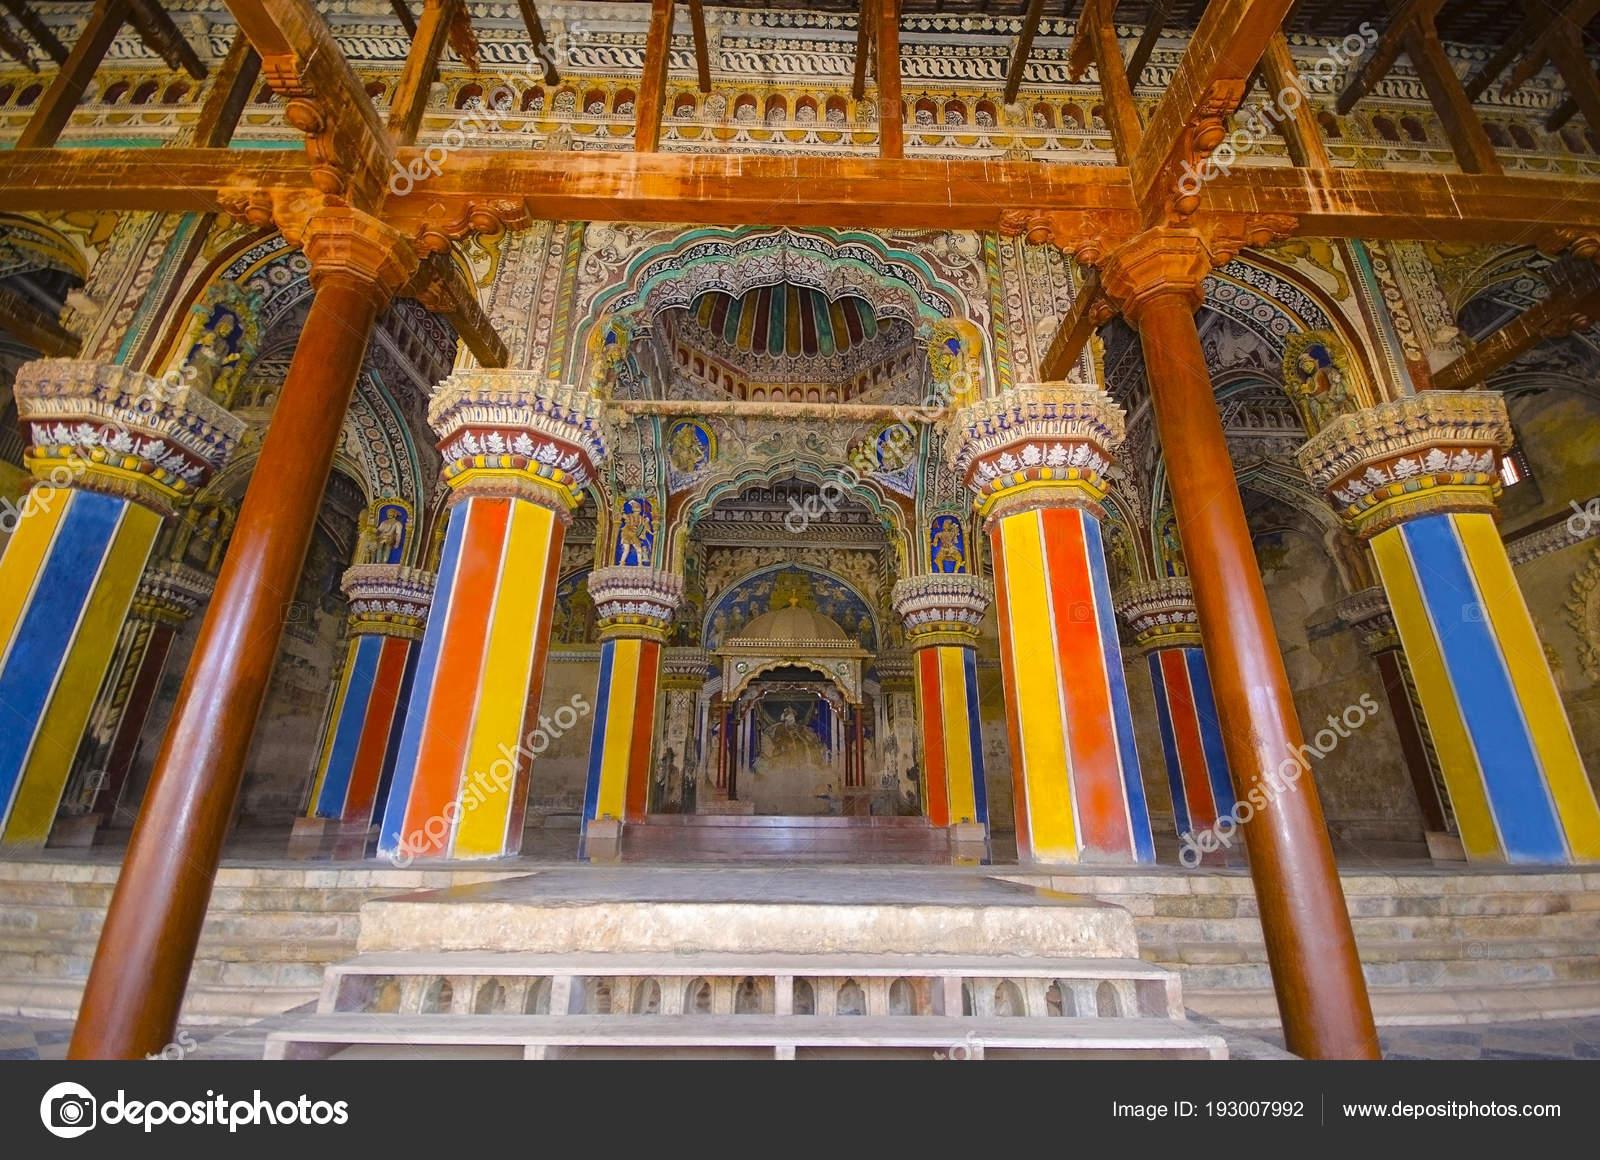 Interior of Durbar Hall, Thanjavur Maratha palace, Thanjavur